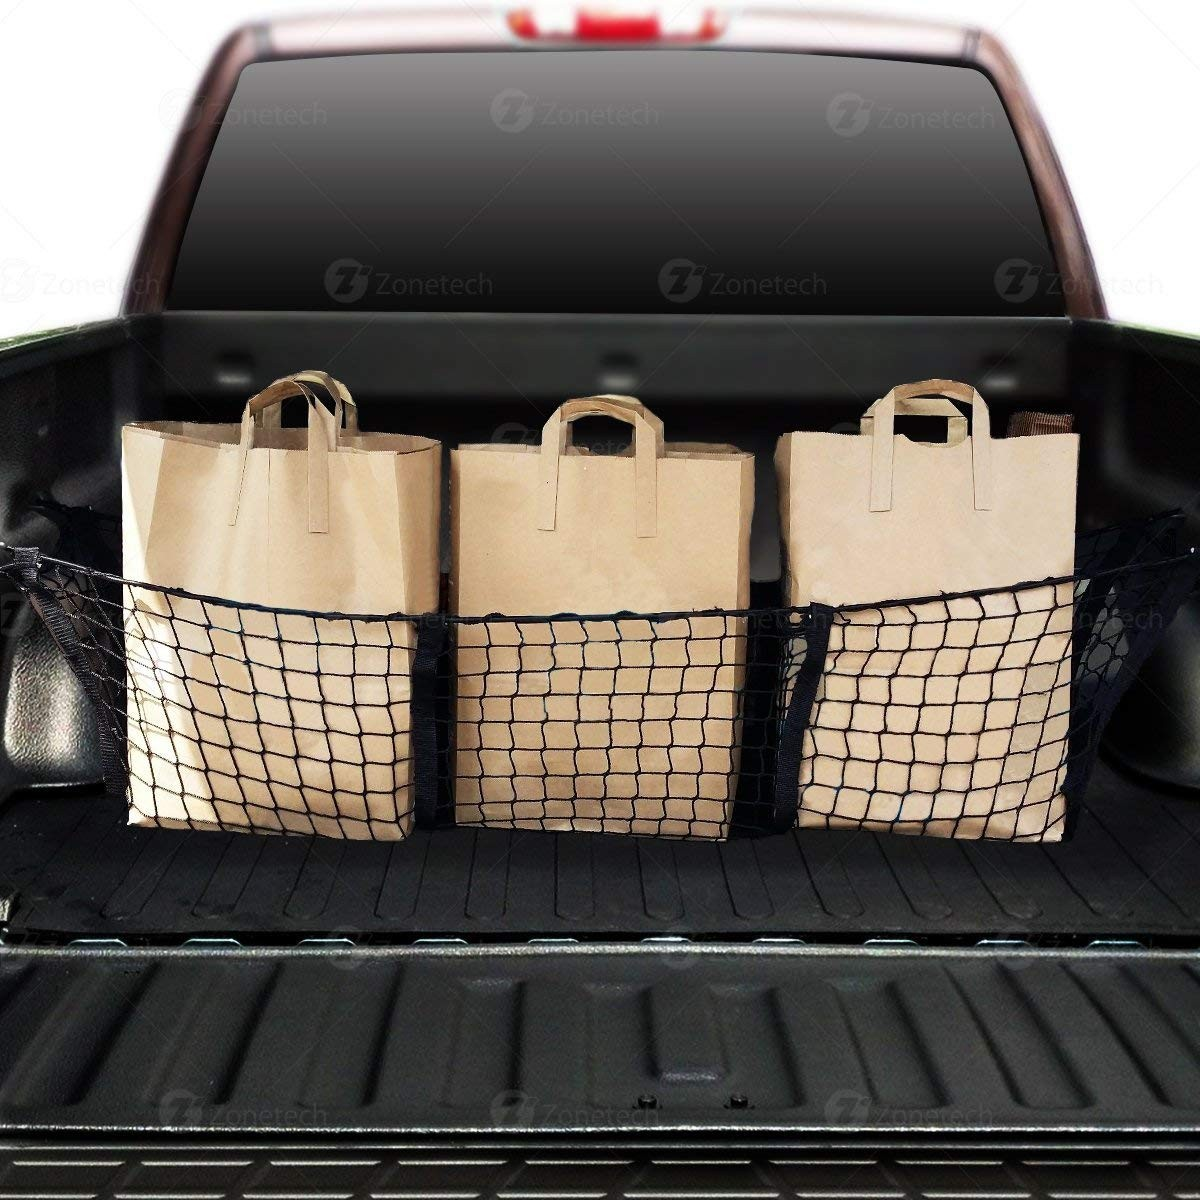 Truck Bed Storage Ideas >> Auto Accessories | Headlight bulbs | Car Gifts Car Trunk Mesh Cargo Net- Zone Tech 3 Pocket Net ...